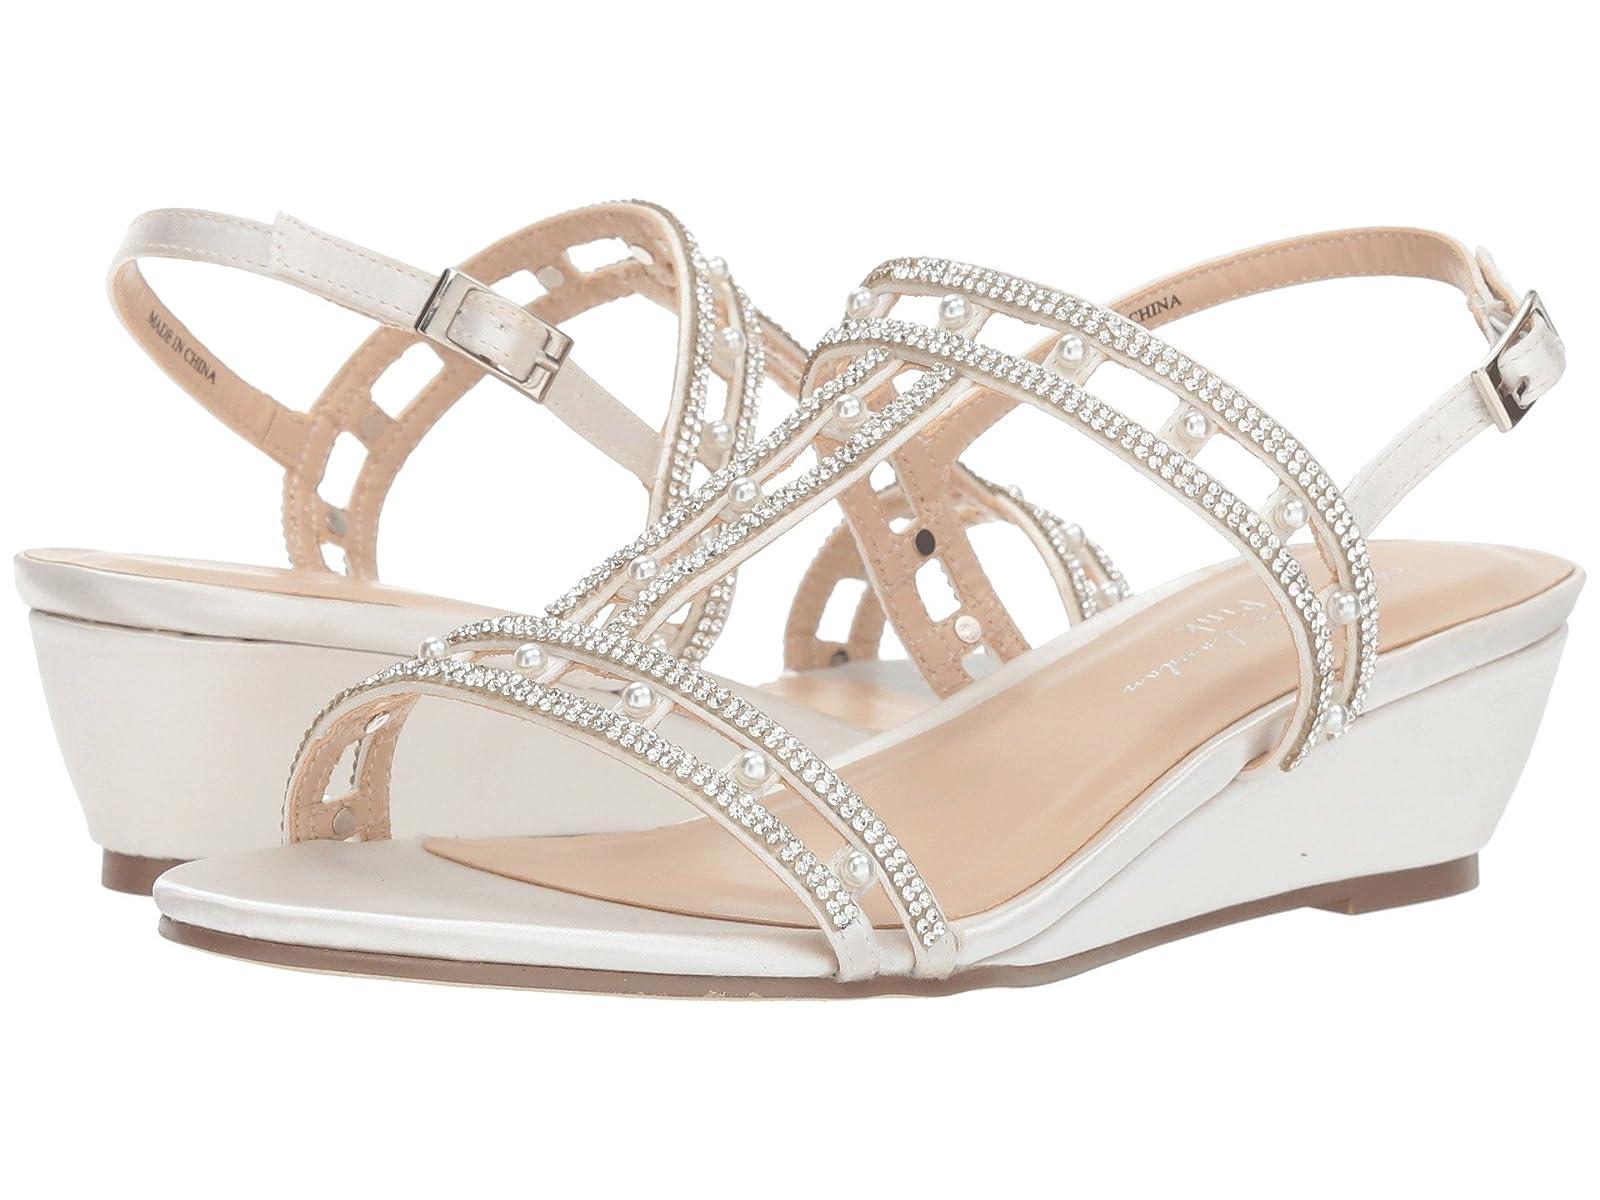 Paradox London Pink KamaraAtmospheric grades have affordable shoes